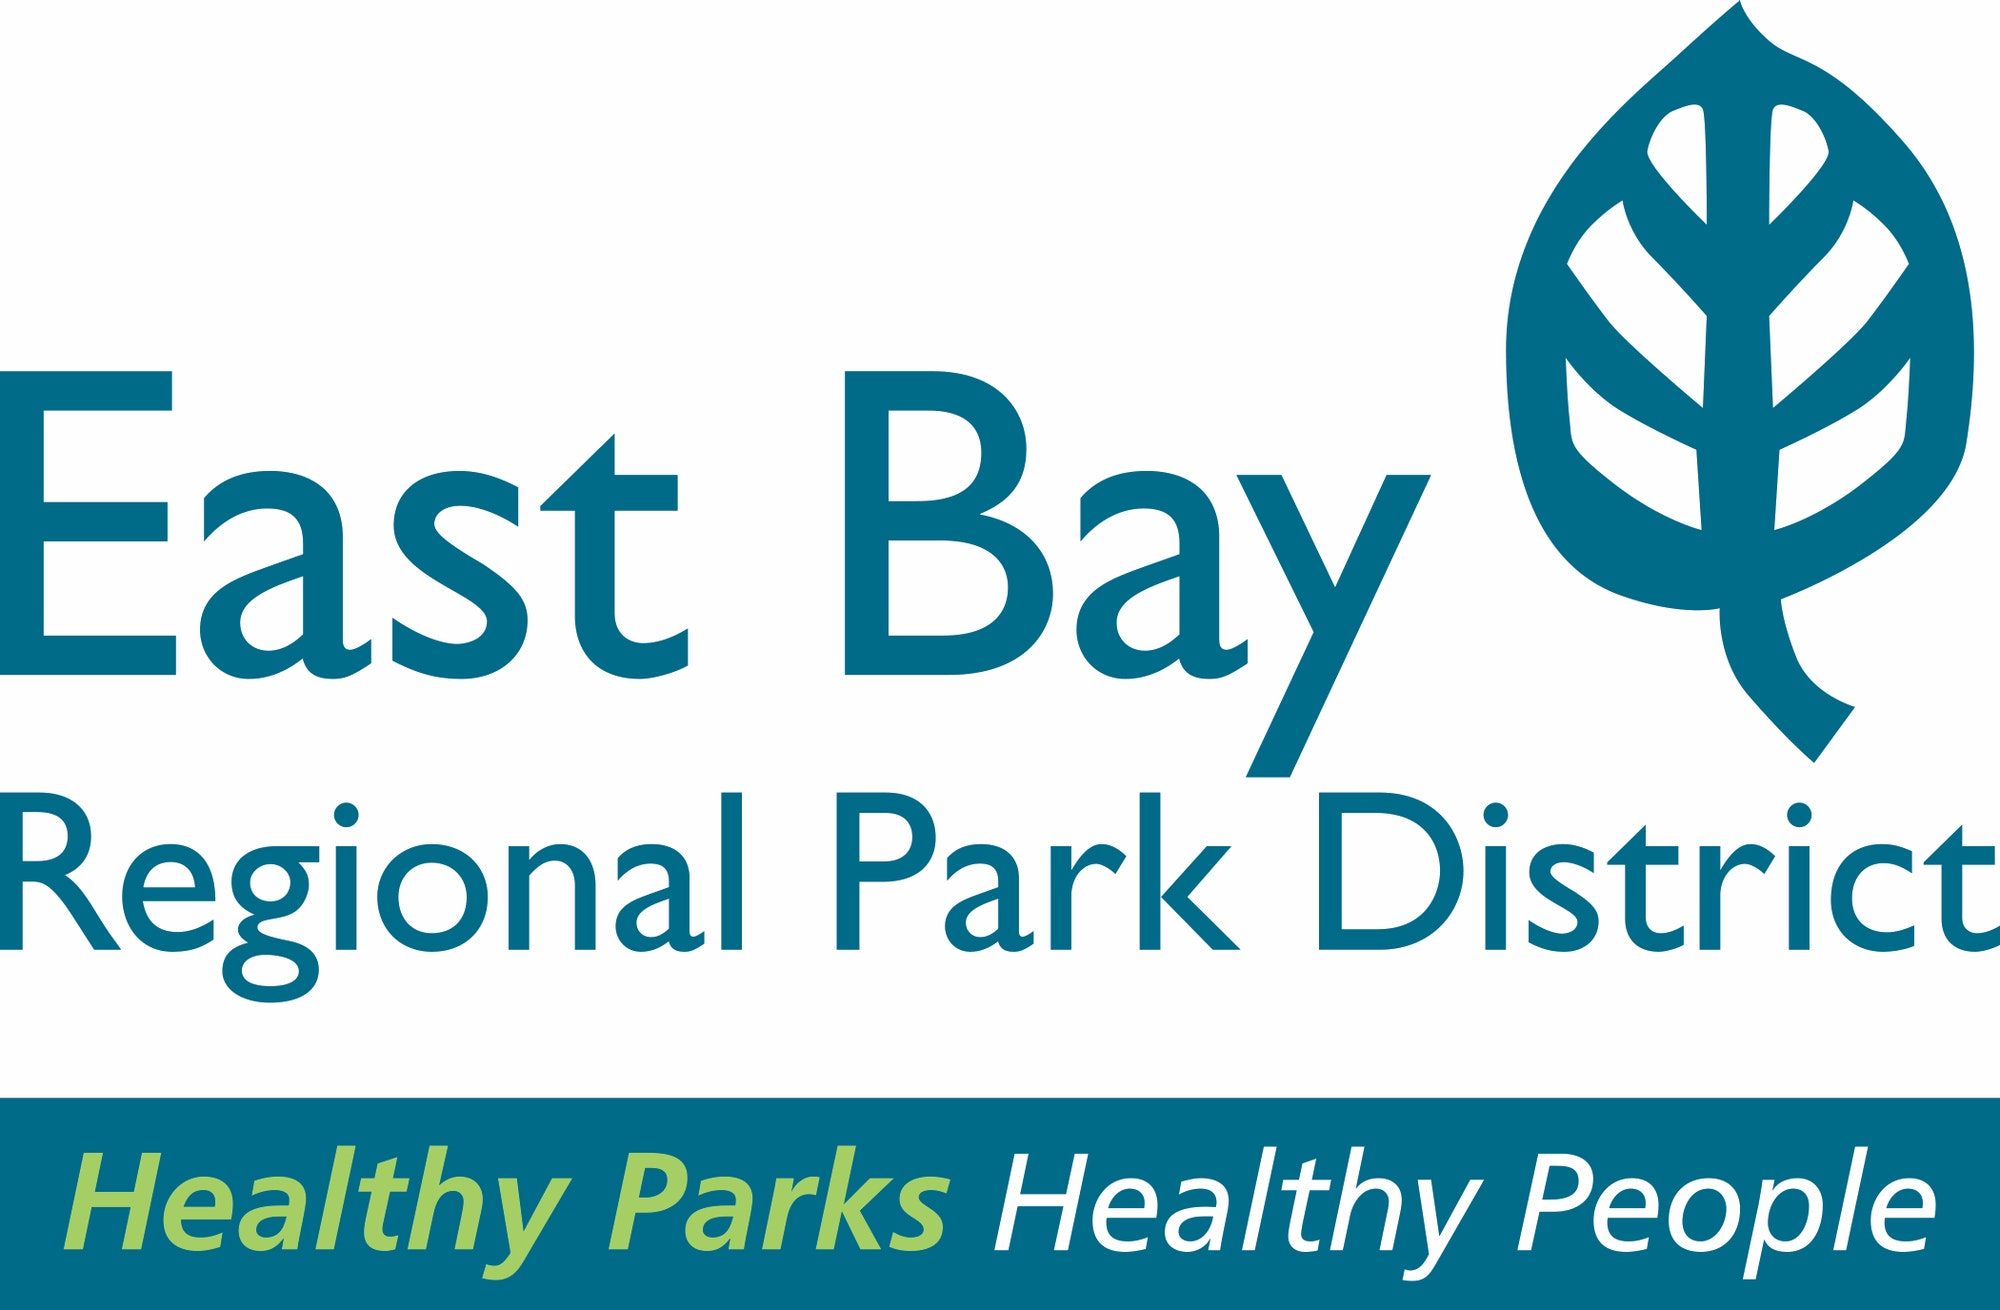 East Bay Regional Park Logo